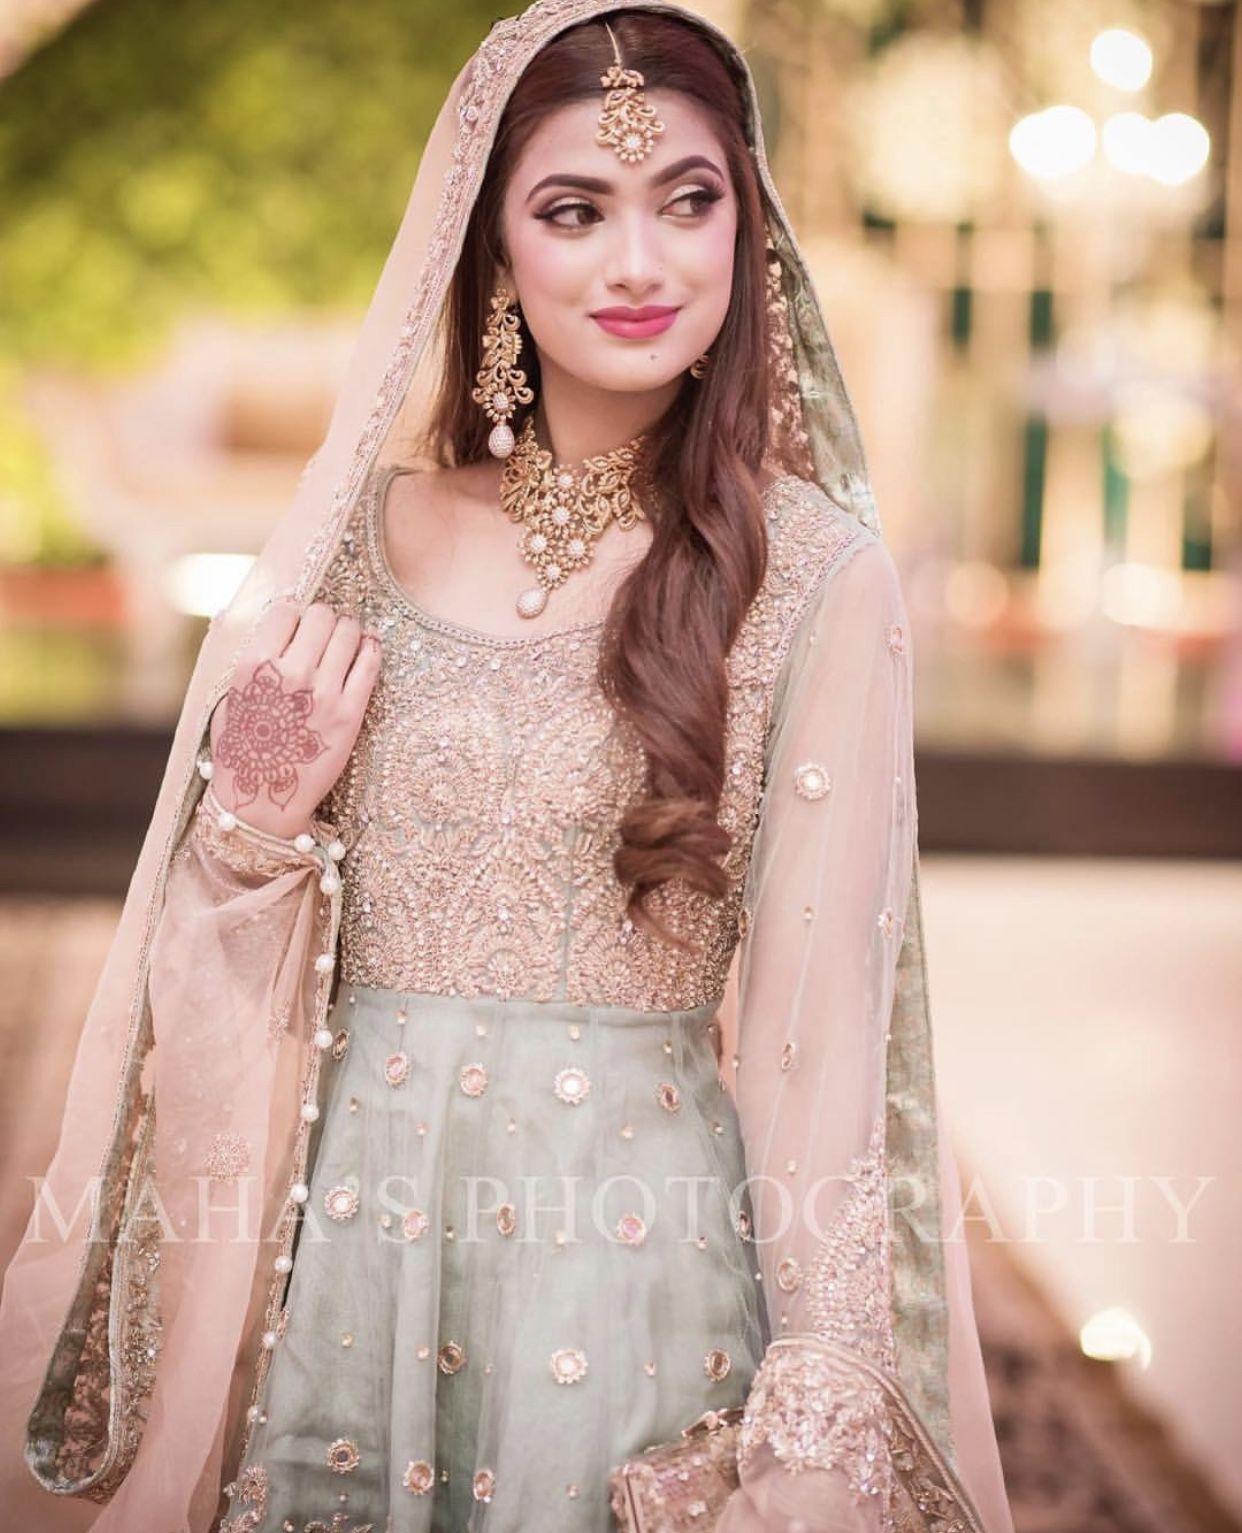 Pin de Anam Hussain en Wedding | Pinterest | Gitano